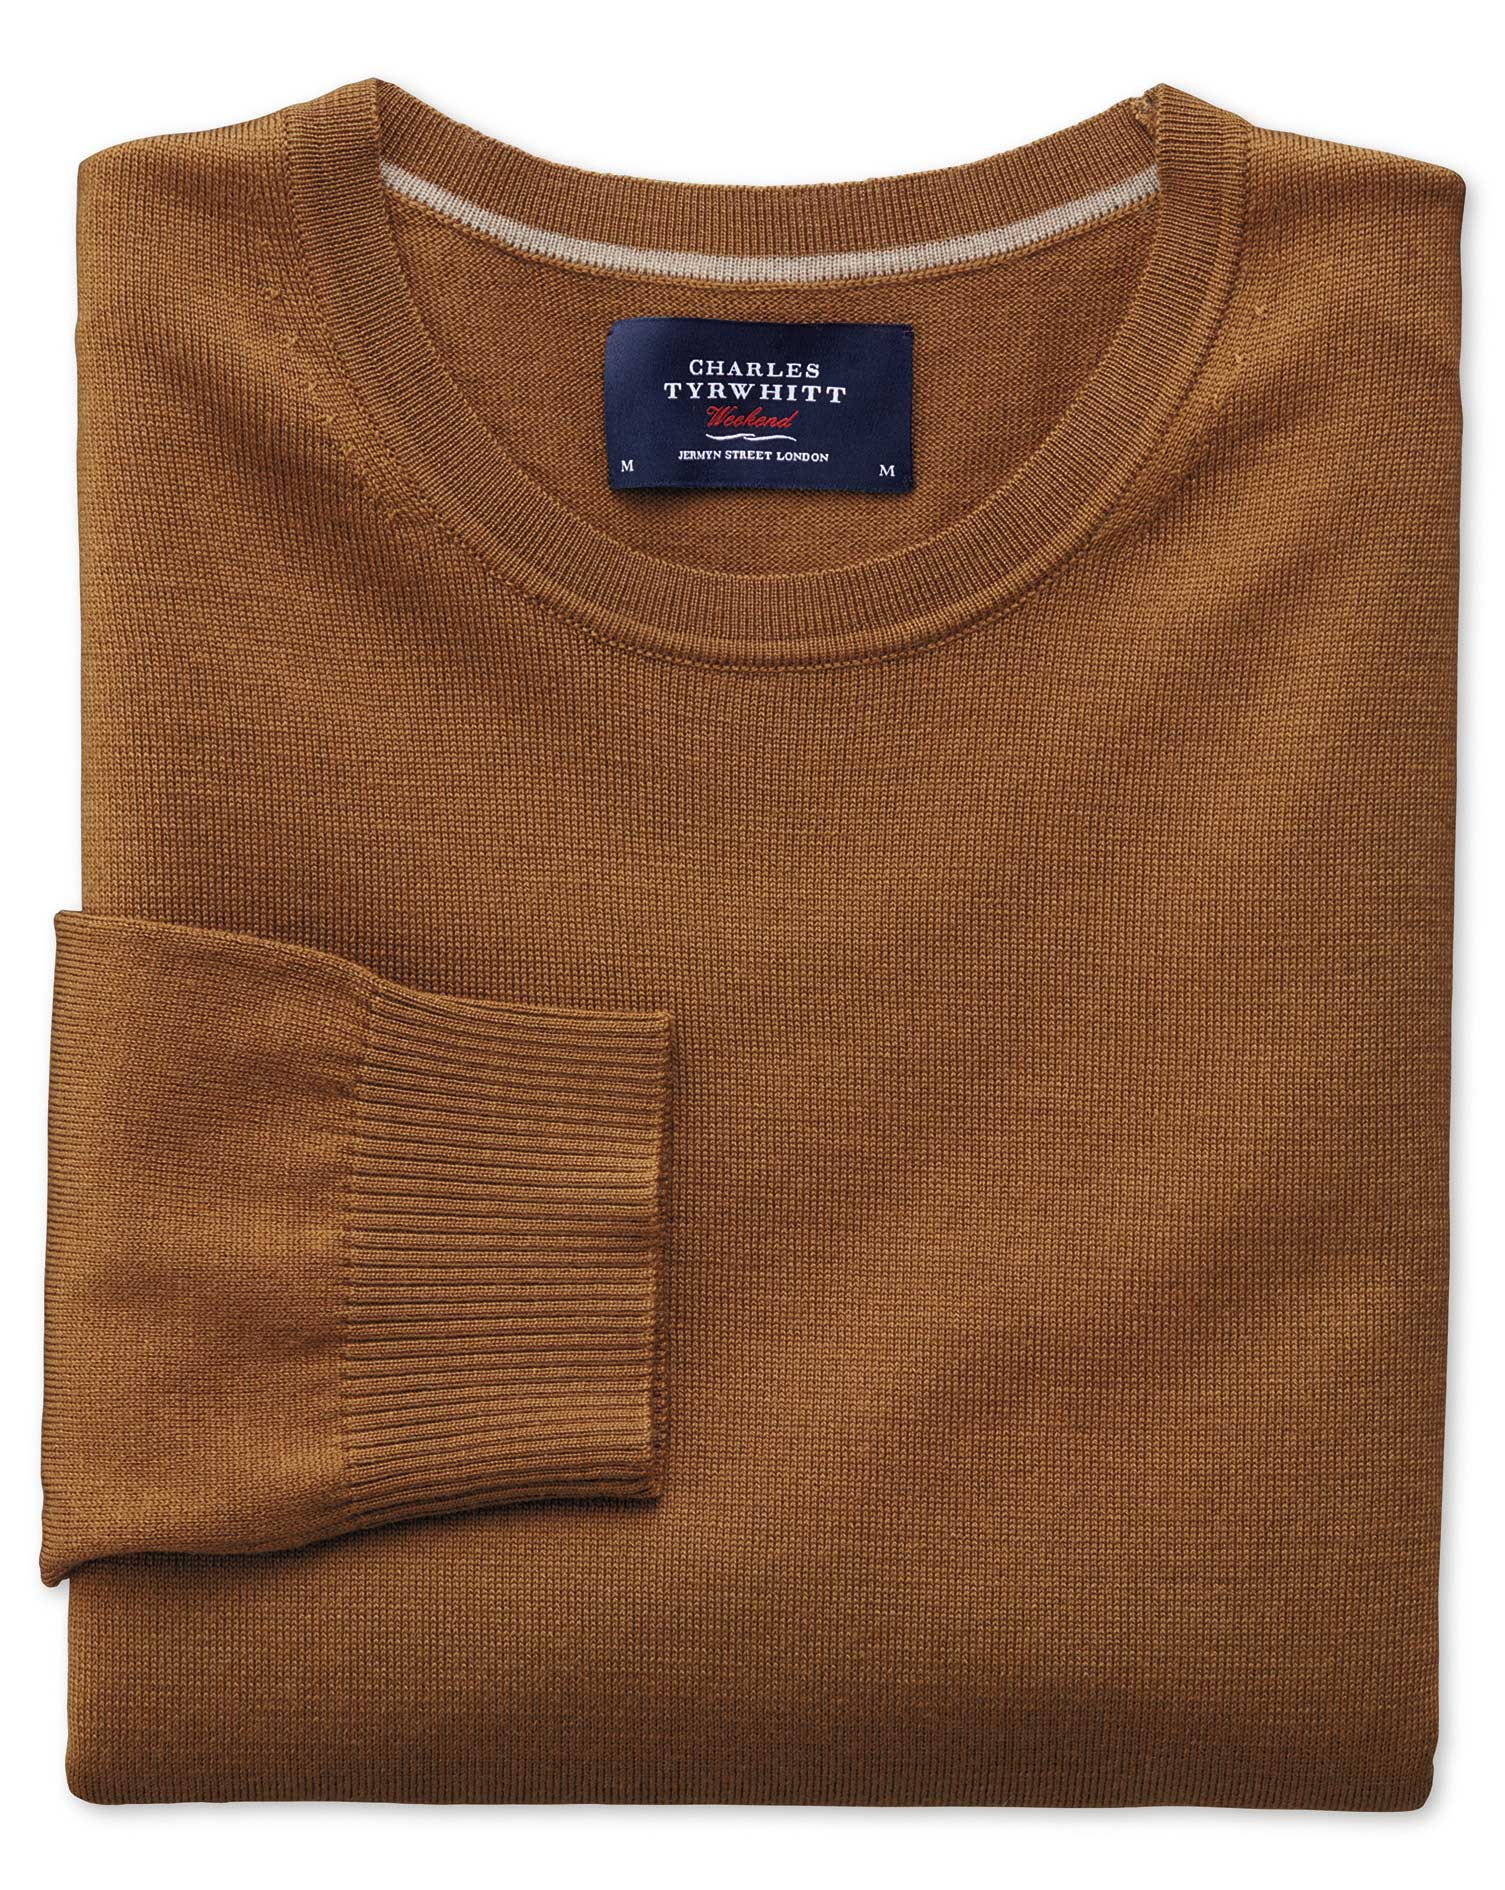 Tan Merino Wool Crew Neck Jumper Size Medium by Charles Tyrwhitt